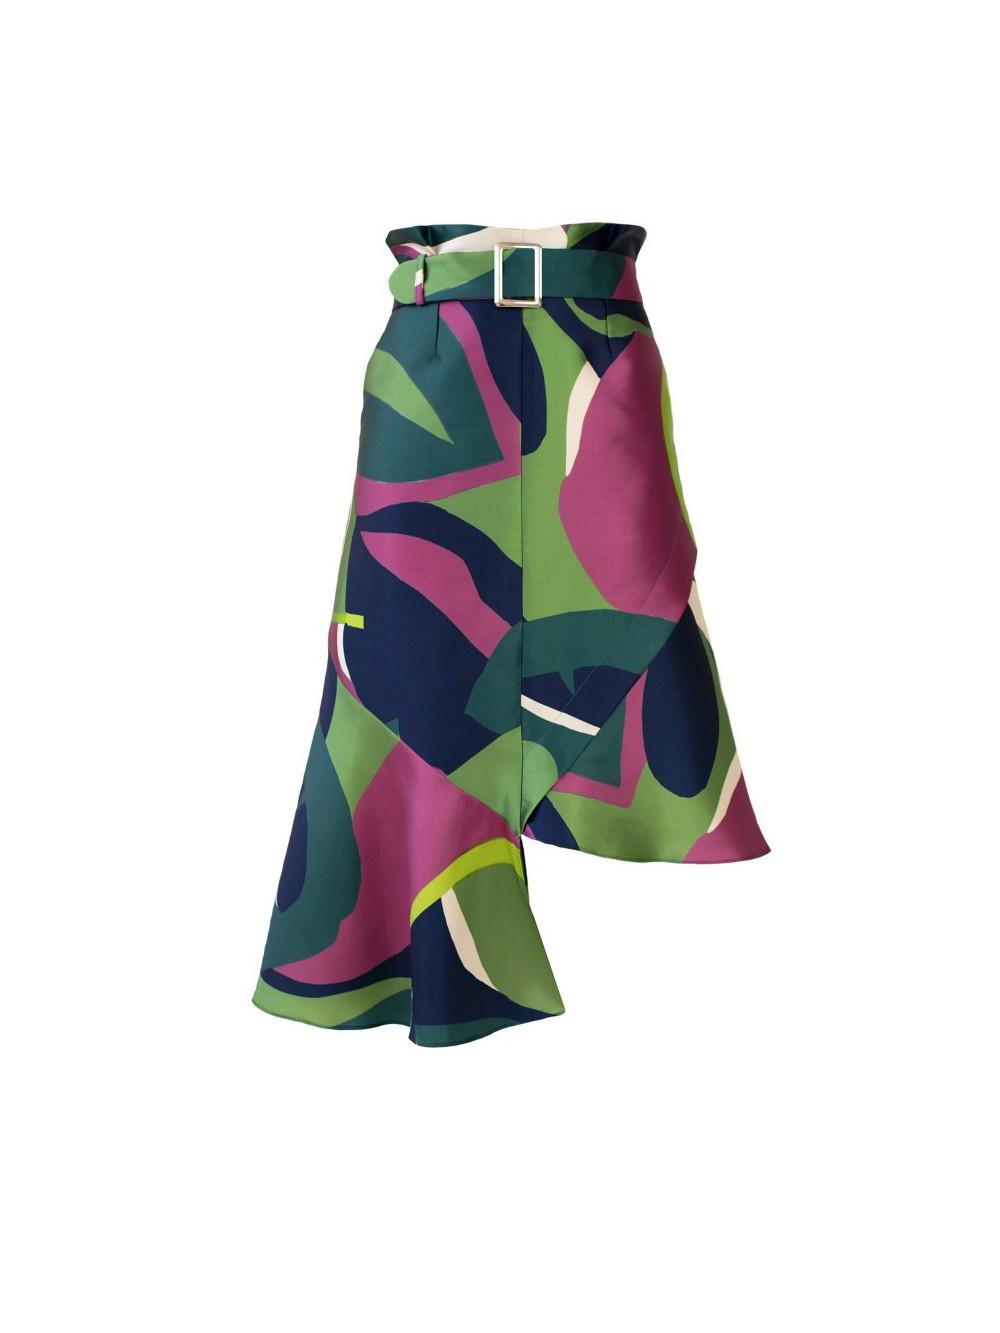 Floral-print  asymmetric skirt | S.O.L.I.T.A.R.Y